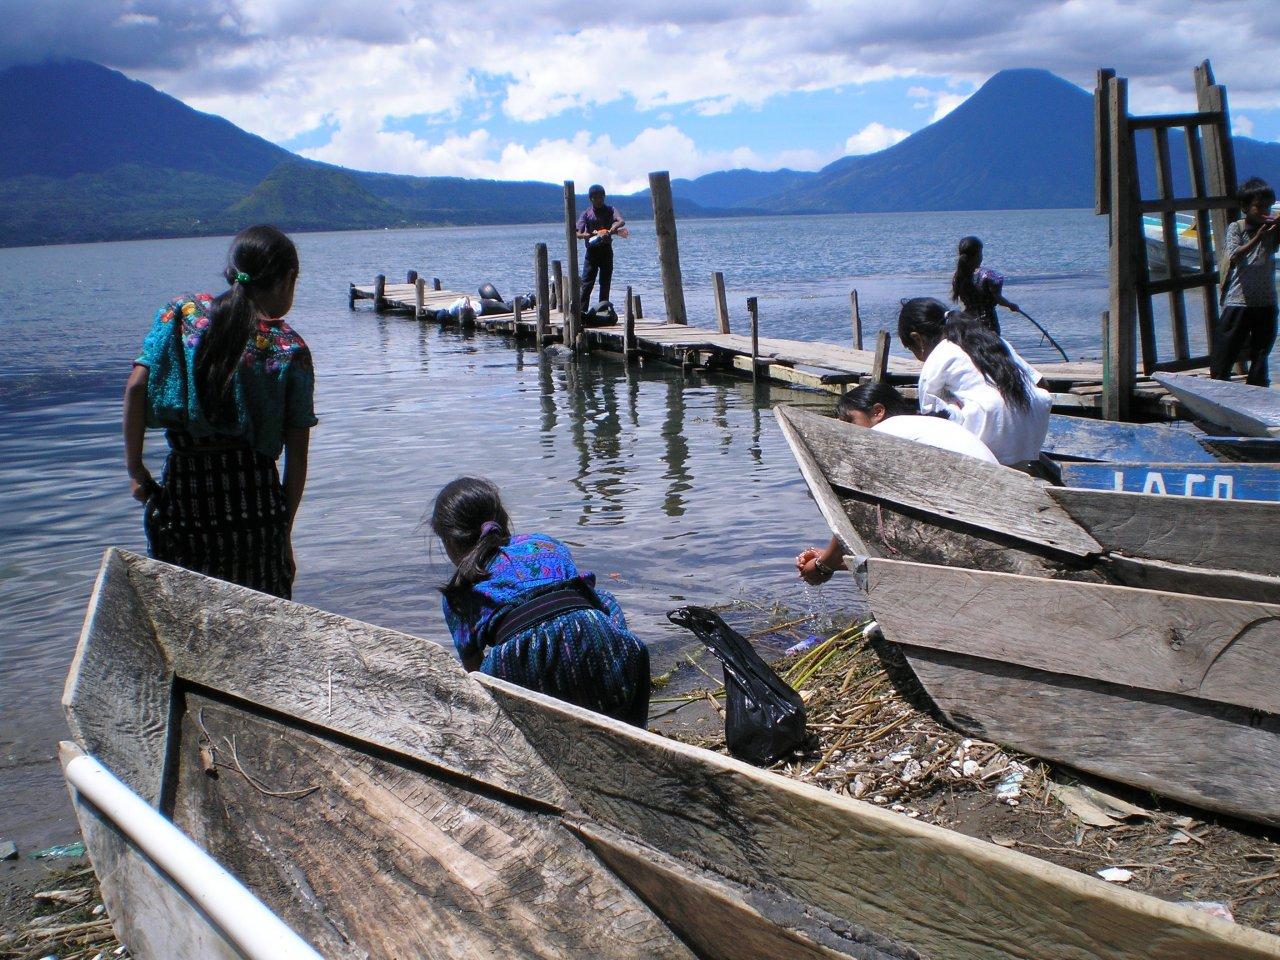 Lake Atitlan Fishing boats